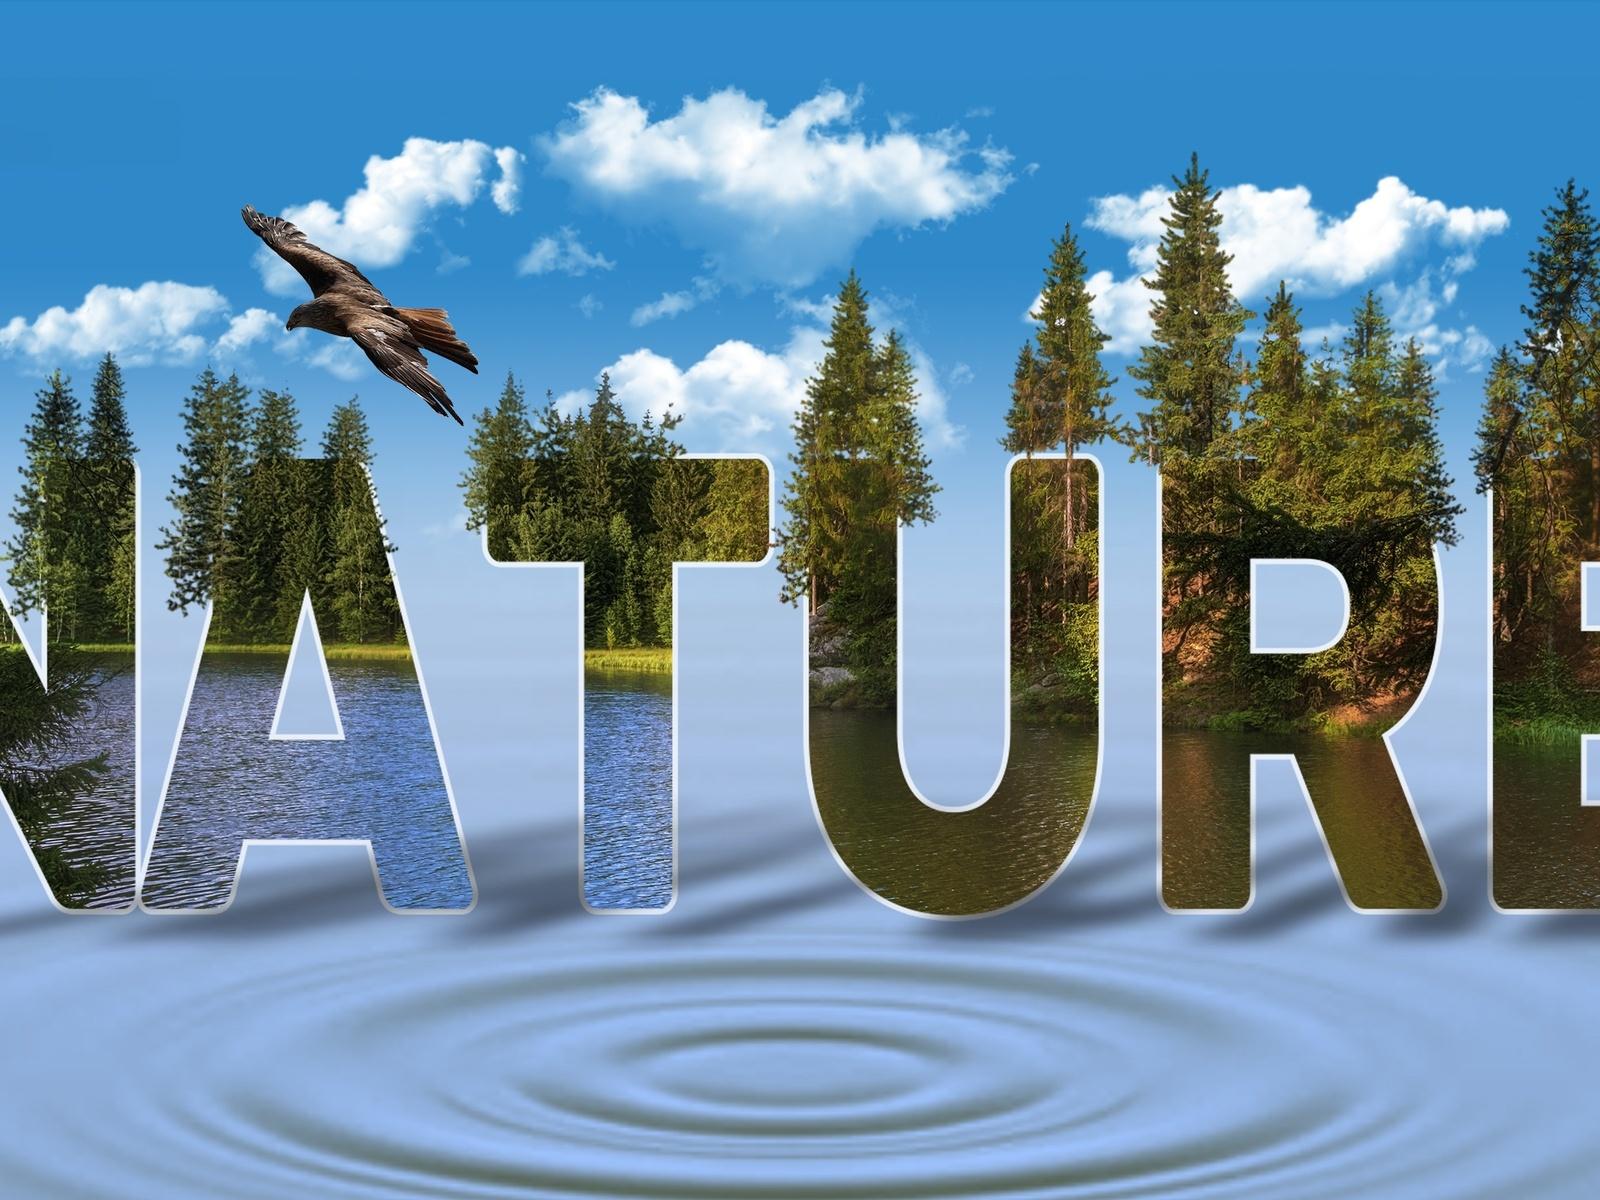 небо, облака, лес, вода, птица, надпись, nature, природа